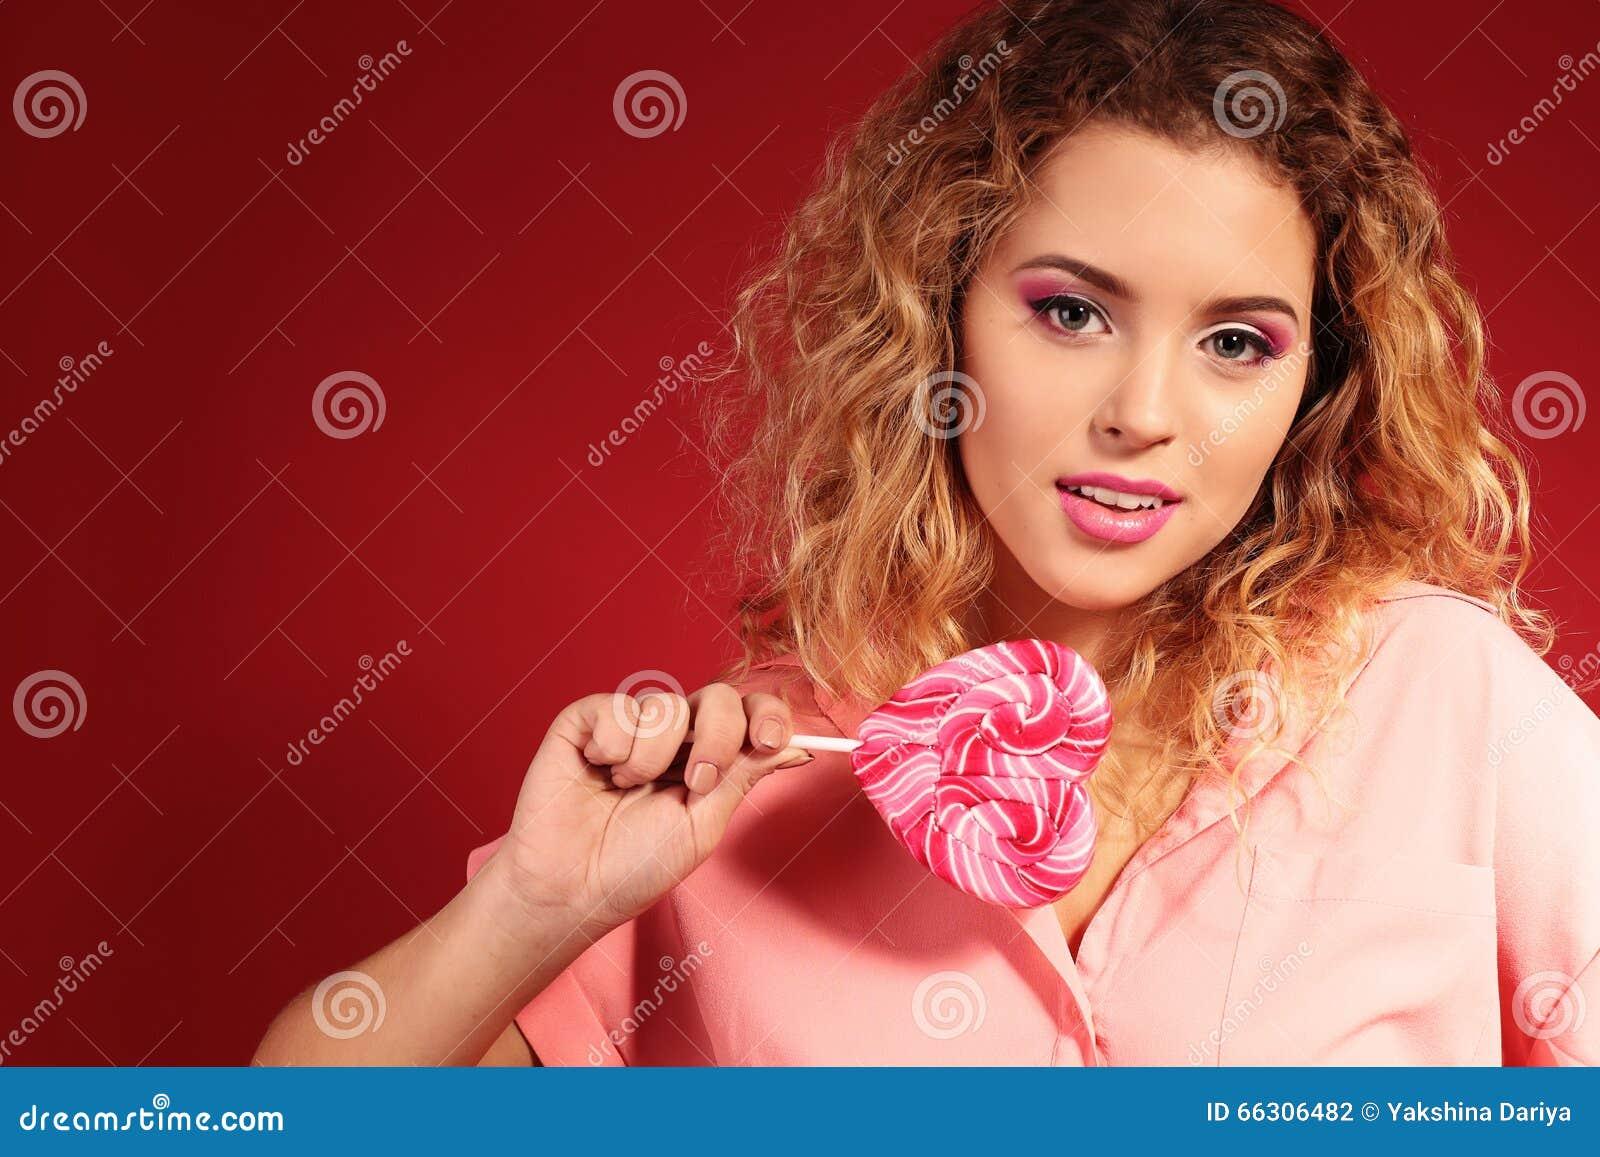 da034e73ef1 Φωτογραφία στούντιο μόδας του όμορφου νέου κοριτσιού με την ξανθή σγουρή  τρίχα και το βράδυ makeup, με την καραμέλα στη μορφή καρδιών